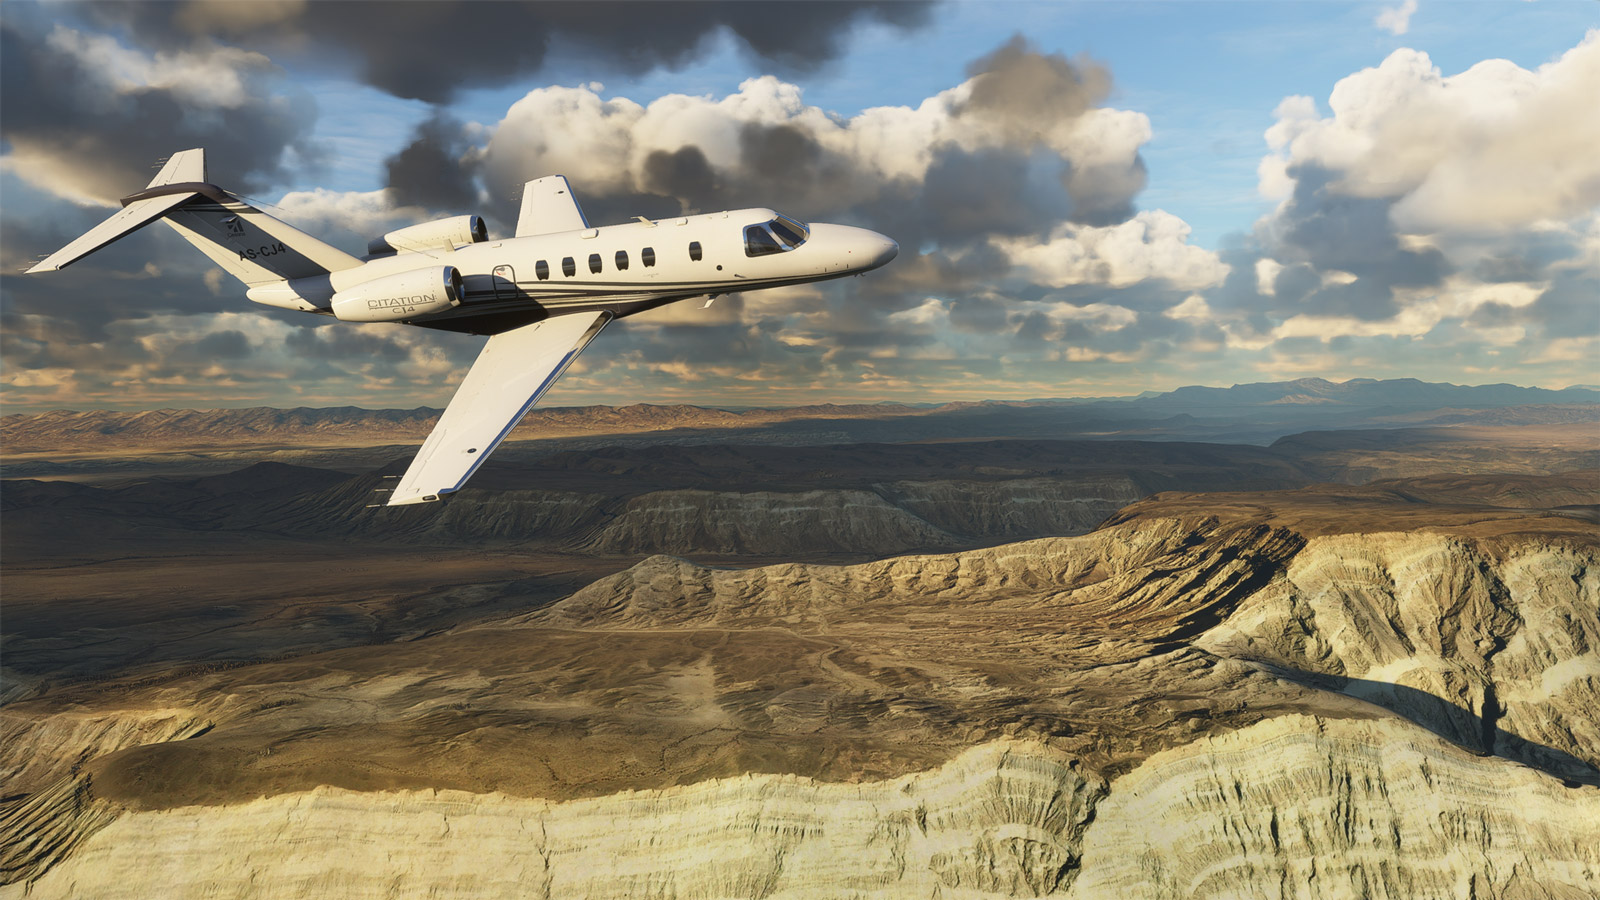 Free Microsoft Flight Simulator (2020) Wallpaper in 1600x900